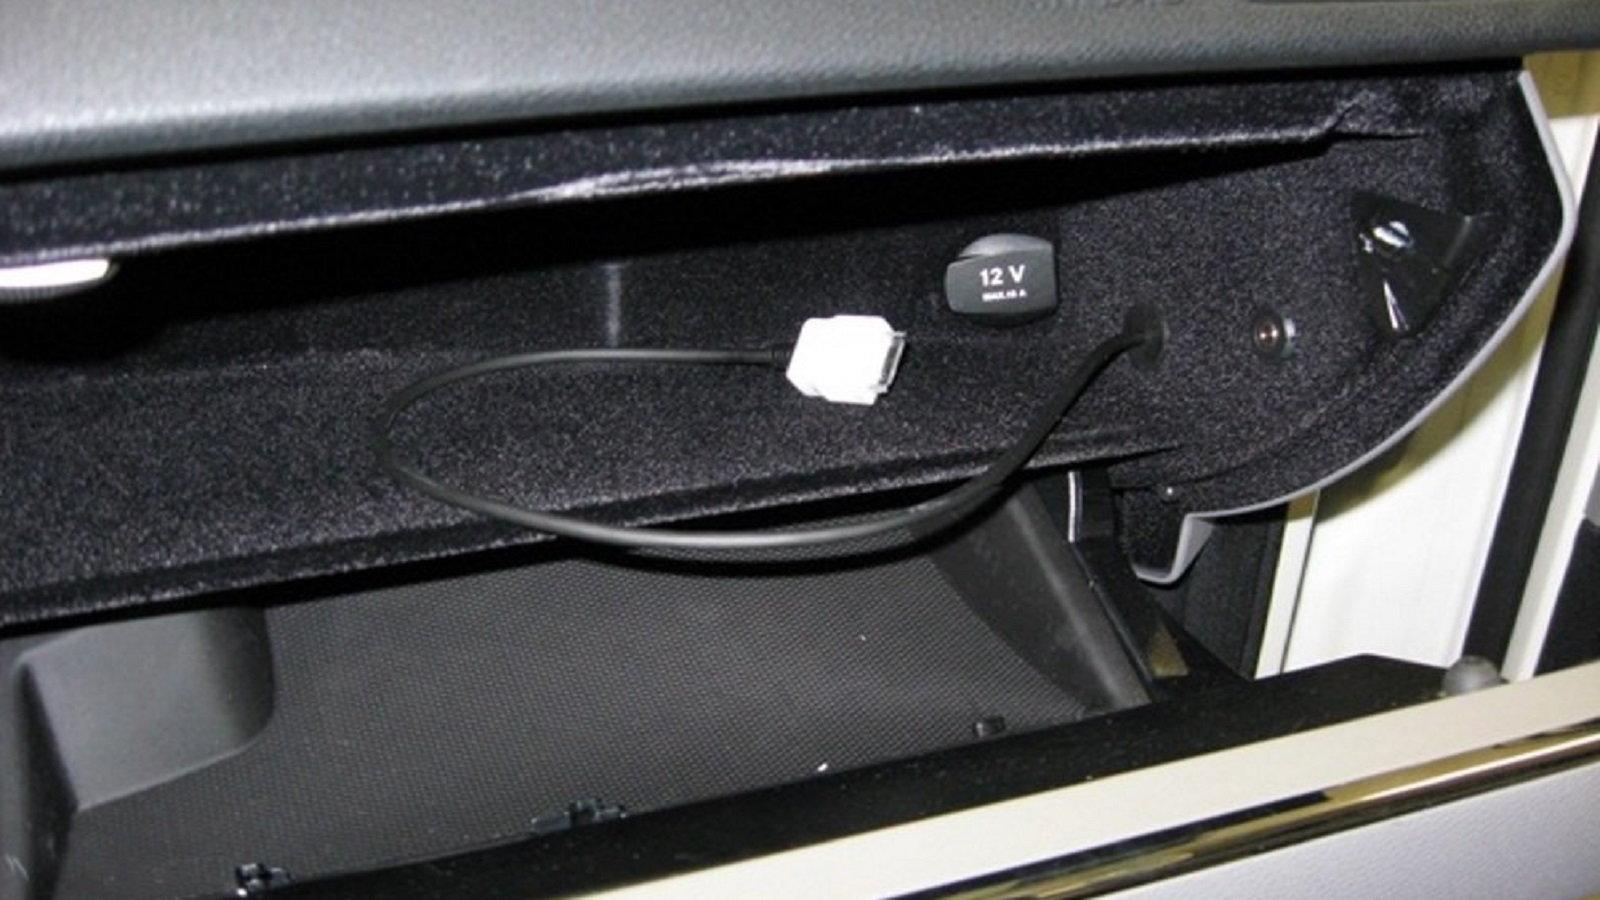 Mercedes Benz W204 C Class How to Access COMAND Secret Menu